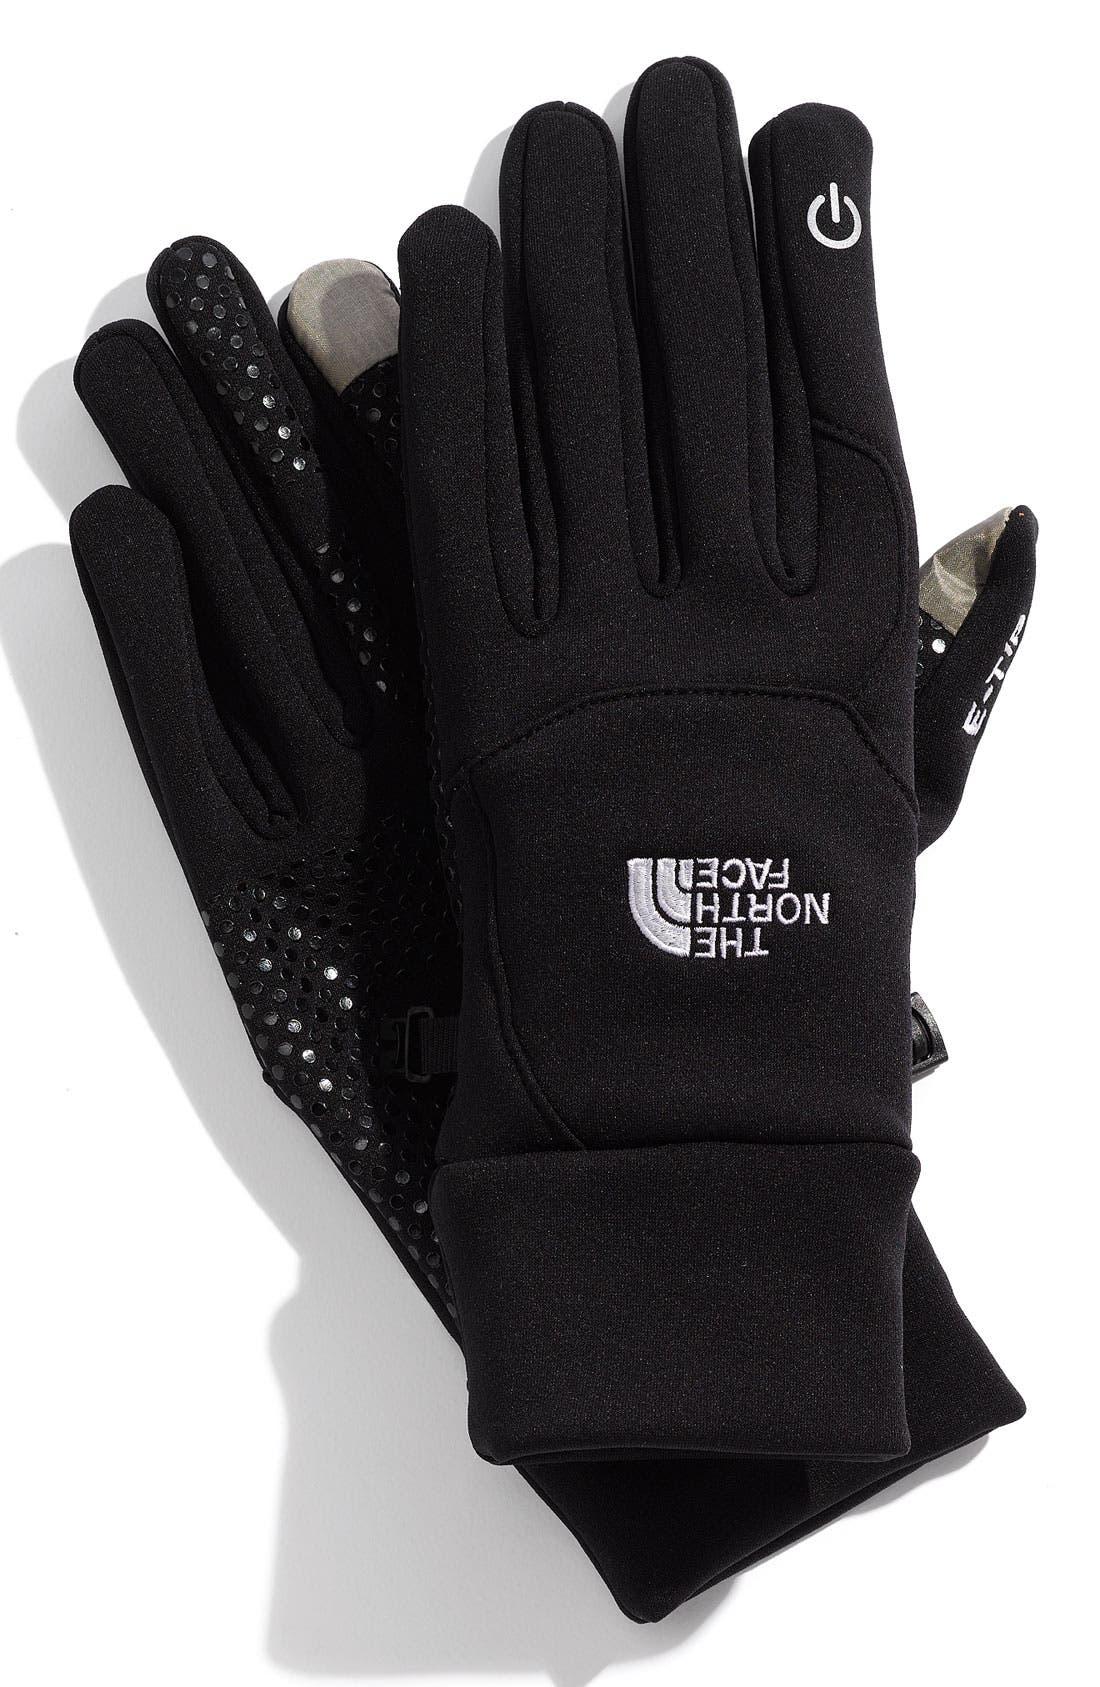 Alternate Image 1 Selected - The North Face E-Tip Gloves (Men)